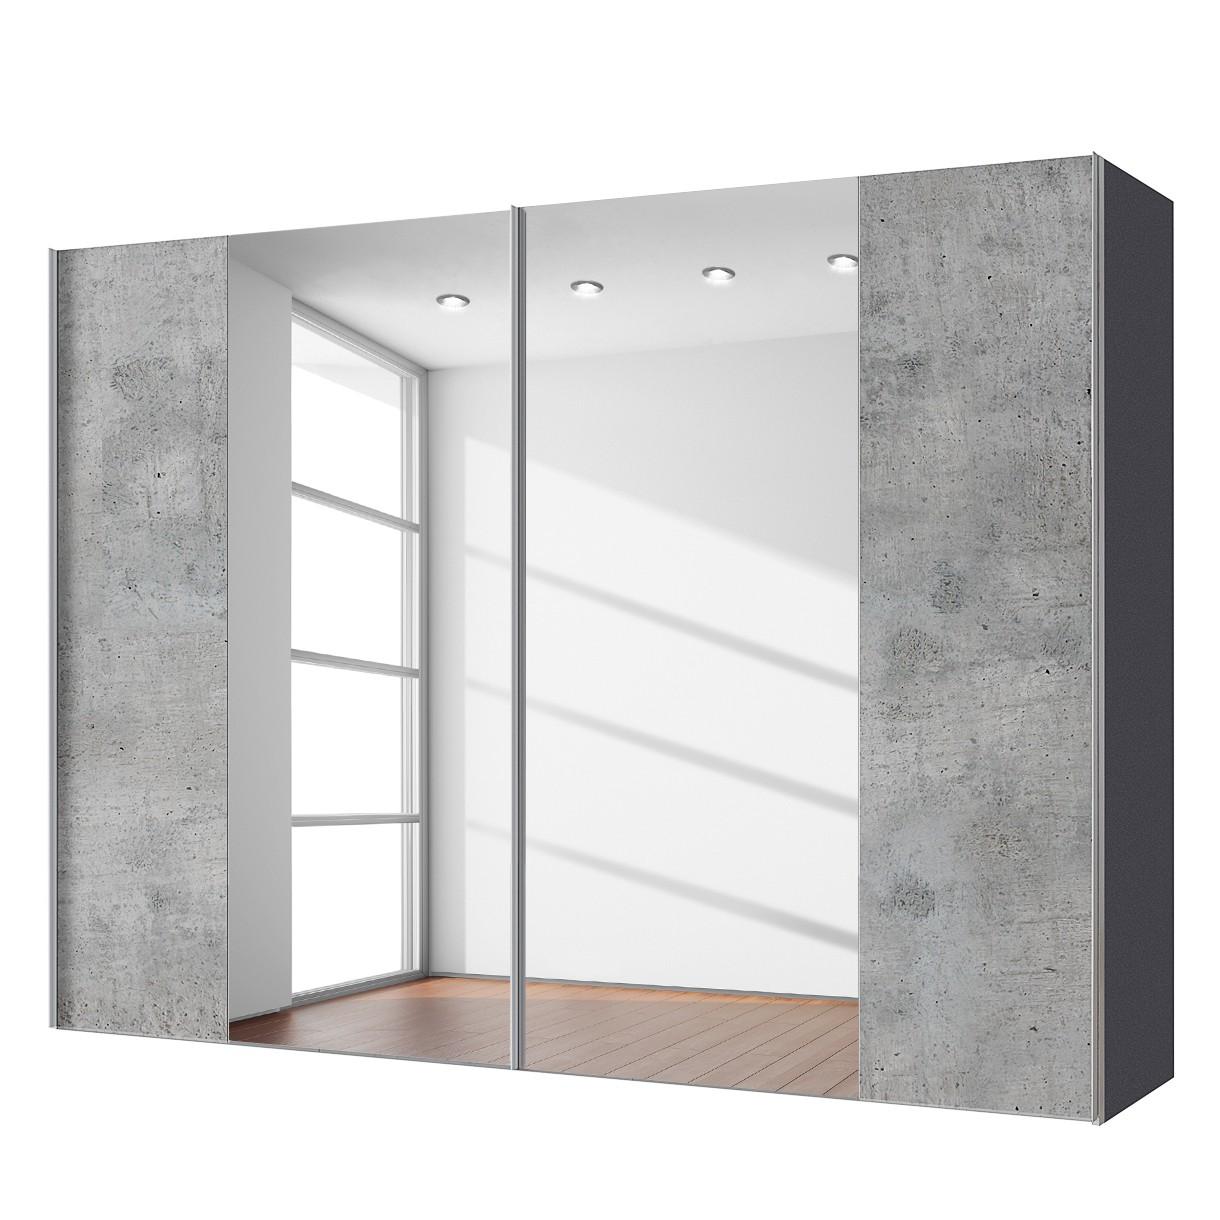 goedkoop Zweefdeurkast Cando Concrete look Spiegelglas 300cm 2 deurs Express Mobel